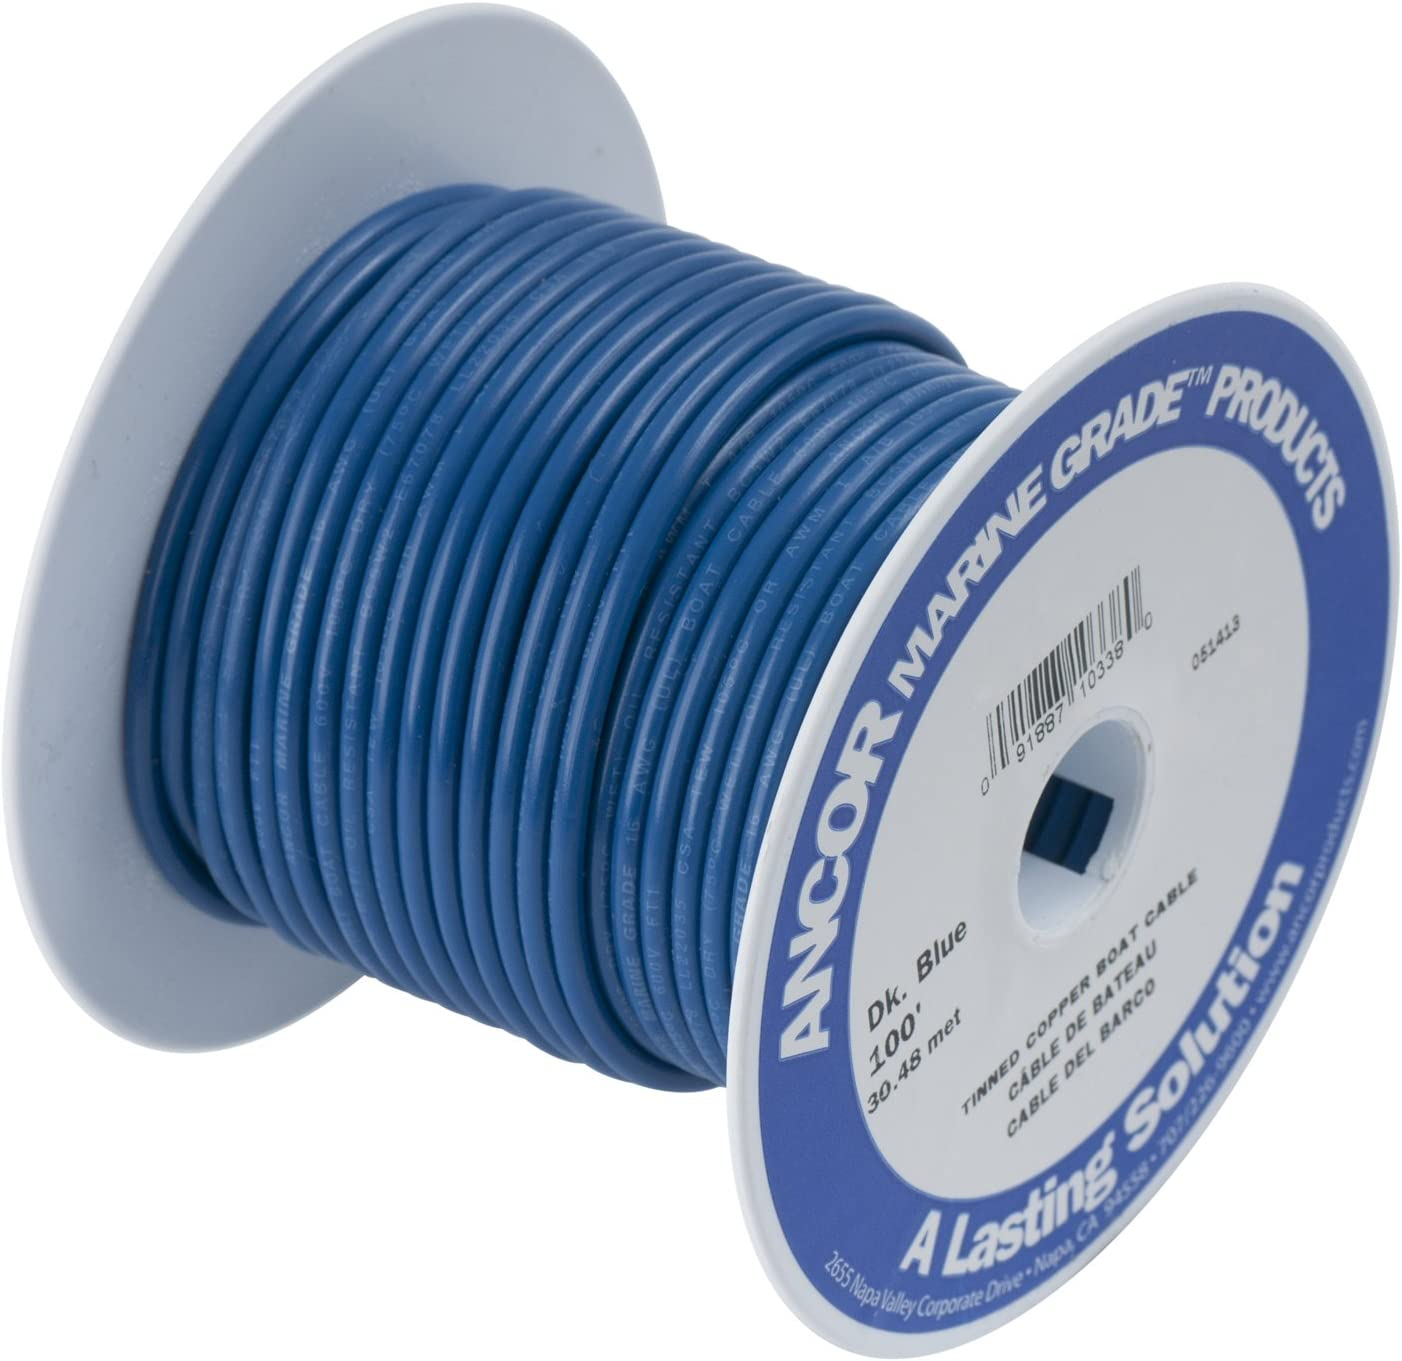 Ancor 184103 Marine Grade Electrical Primary Tinned Copper Boat Wiring 14-Gauge, Dark Blue, 18-Feet